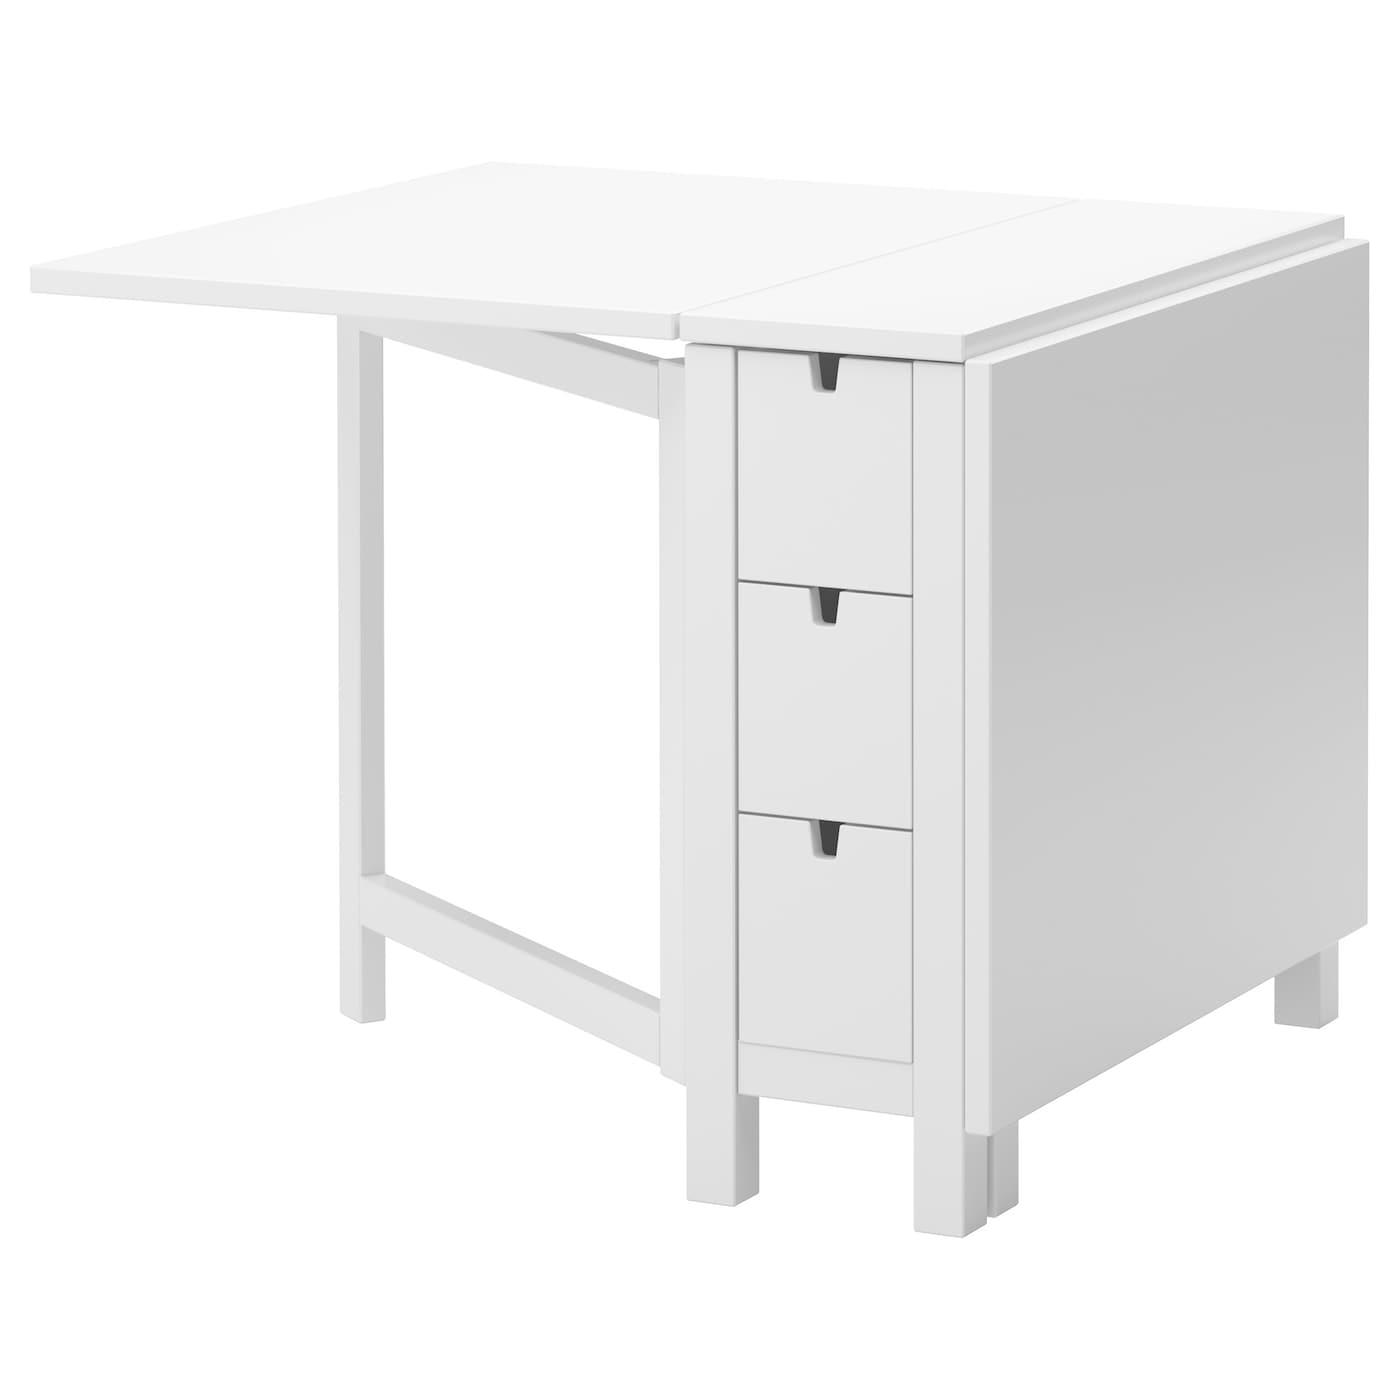 Mesas extensibles | Mesas de comedor | Compra Online IKEA